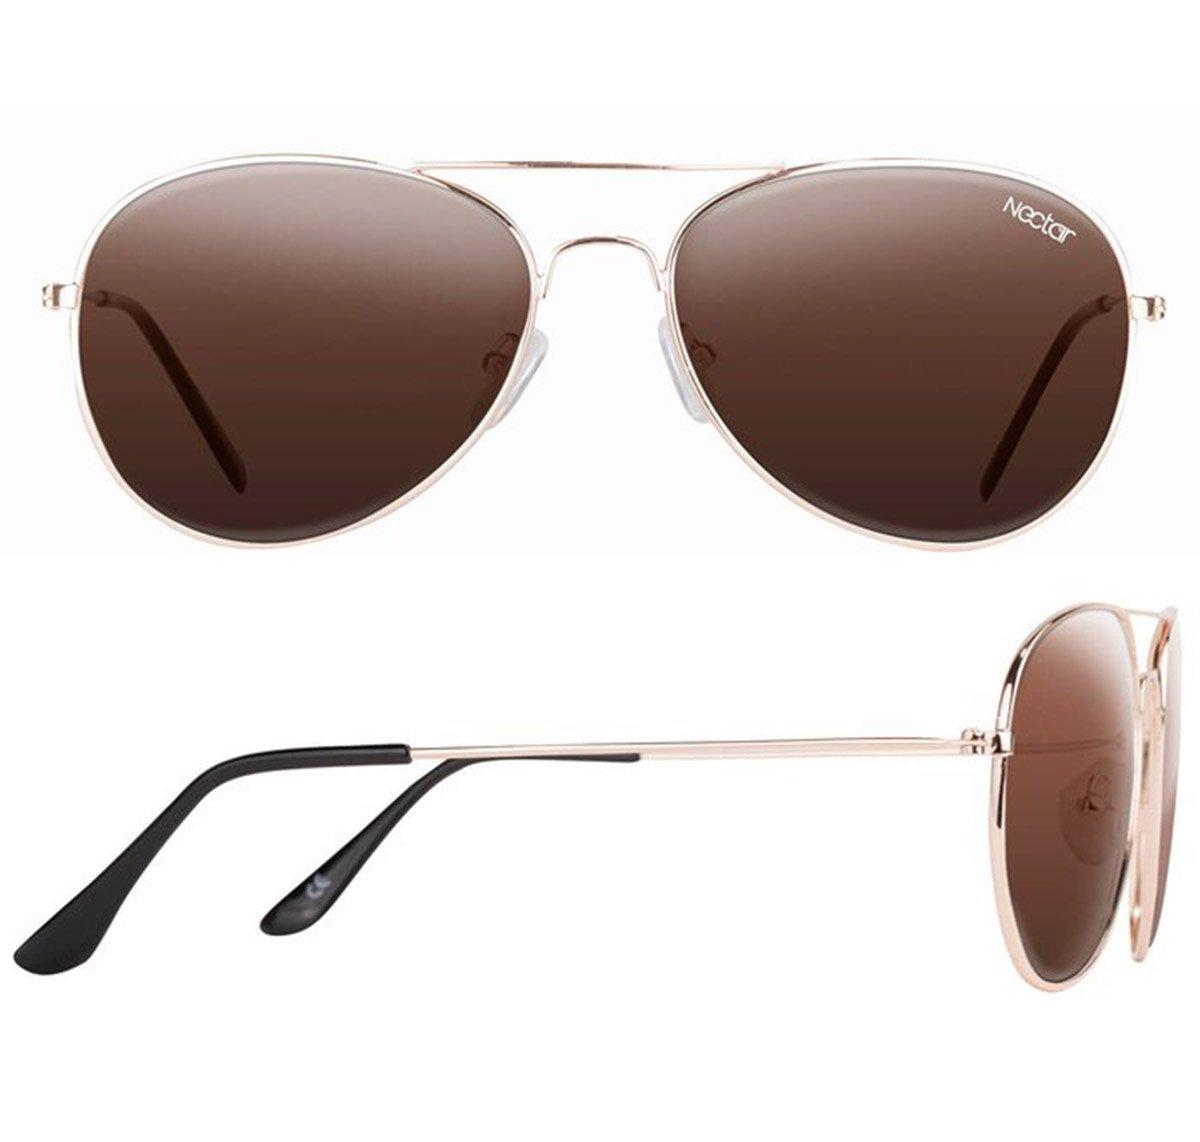 5dd8e4de929 Nectar SULLY Polarised Aviator Sunglasses GOLD TAN  Amazon.co.uk  Sports    Outdoors